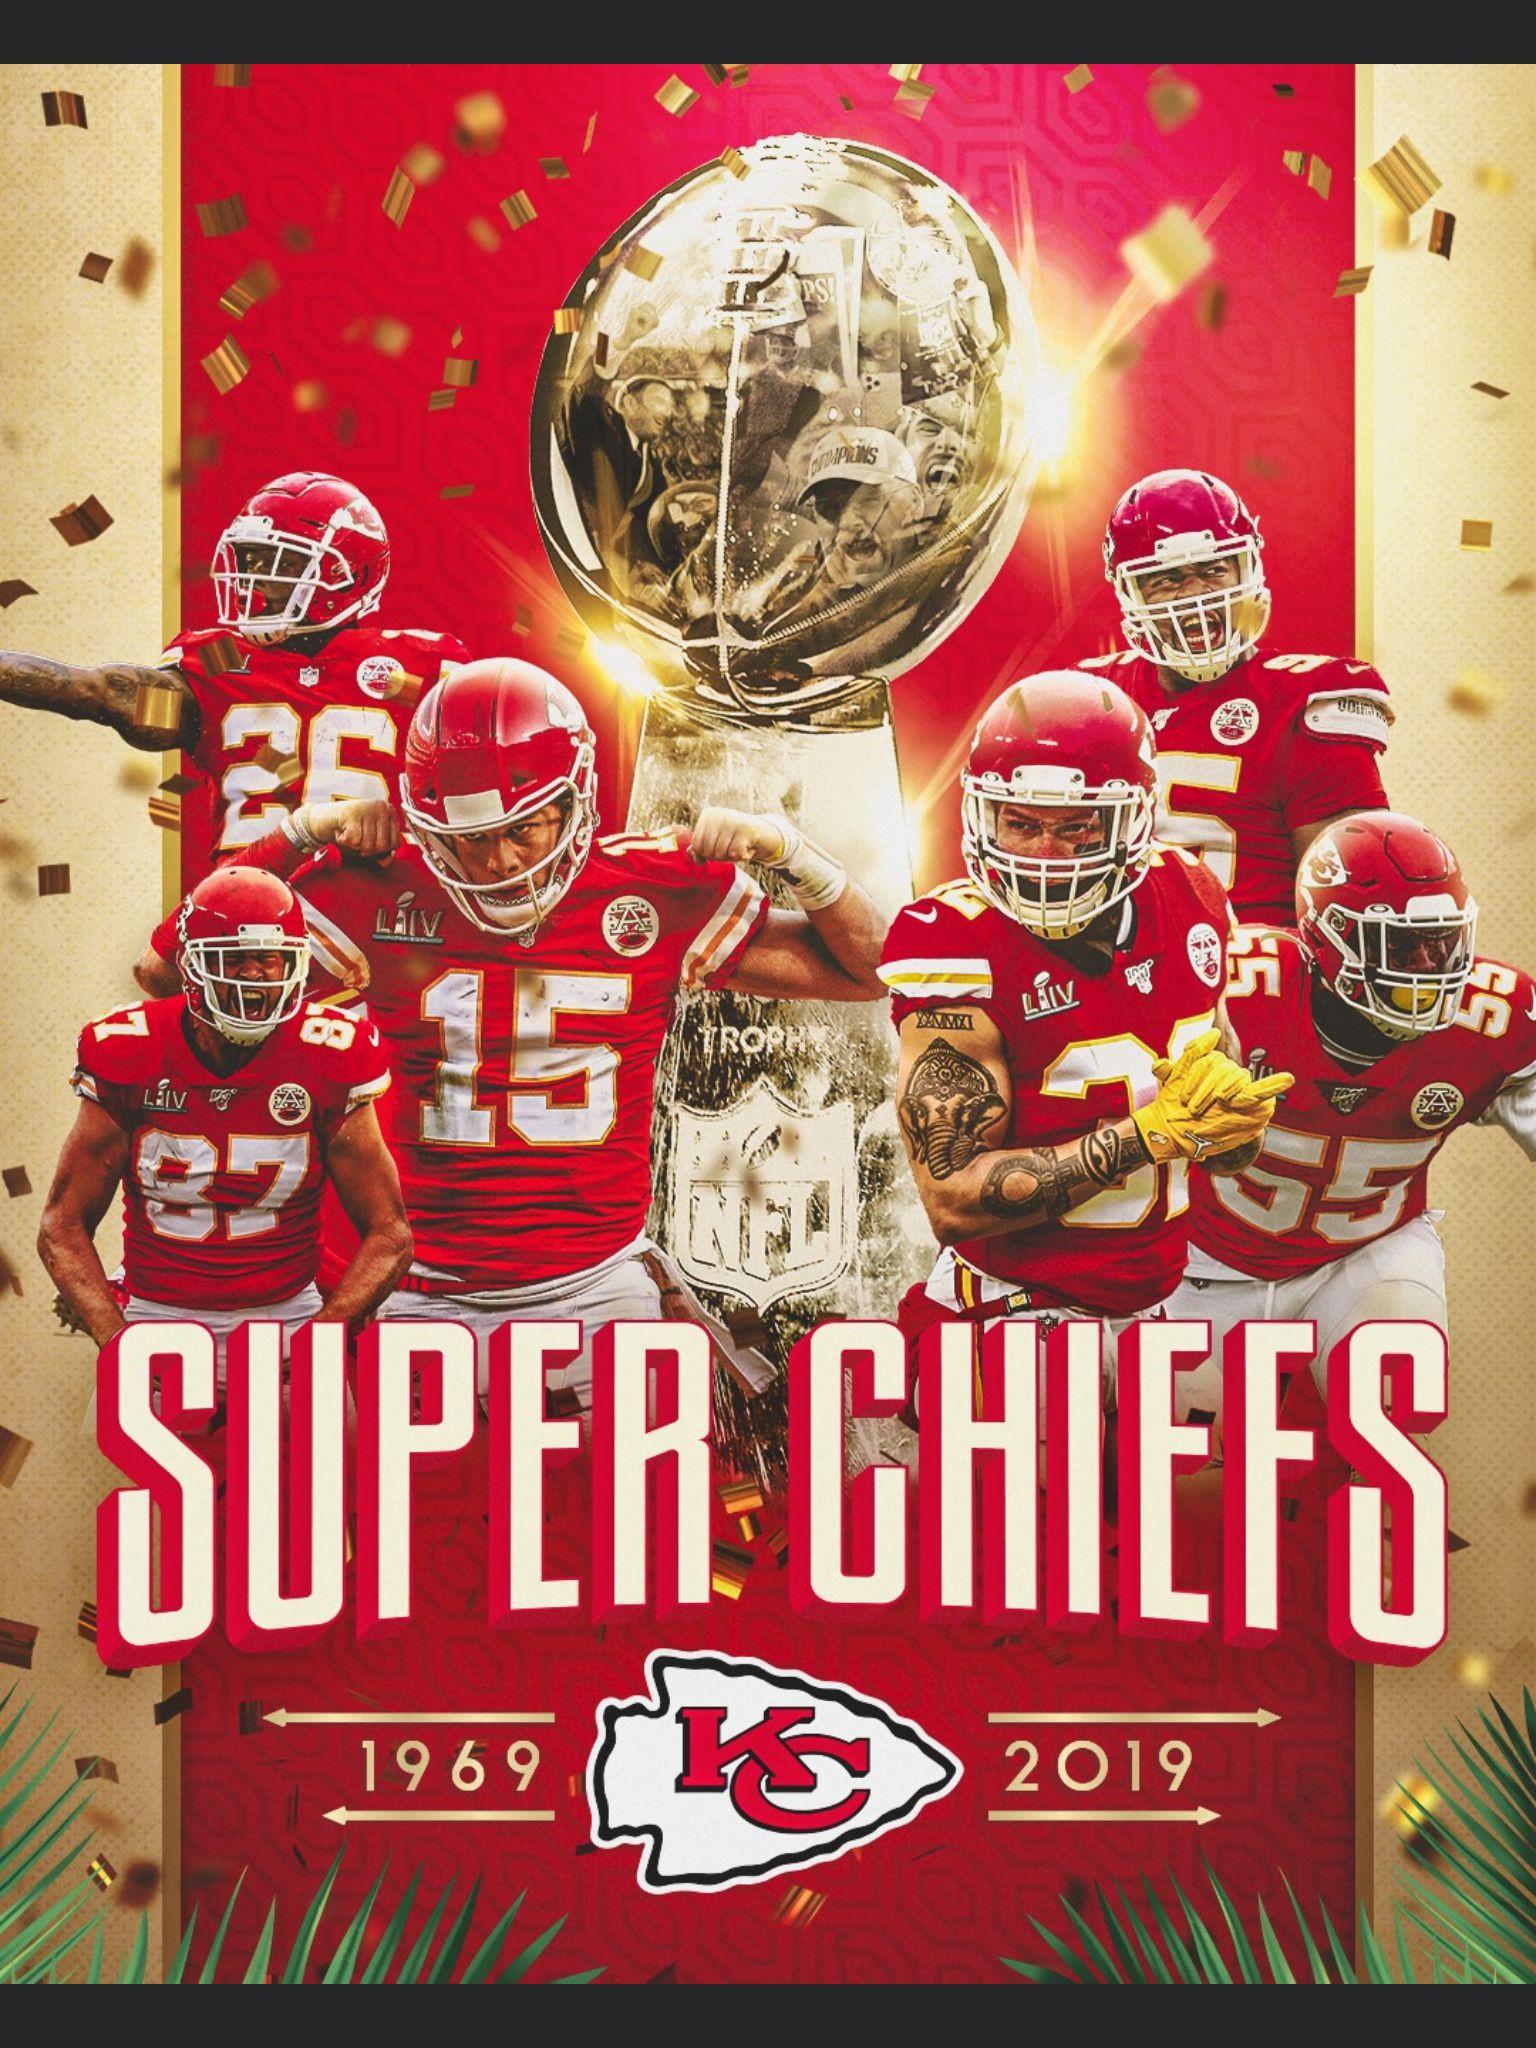 Pin By Debi Bressman On Chiefs Football In 2020 Chiefs Wallpaper Kansas City Chiefs Chiefs Football